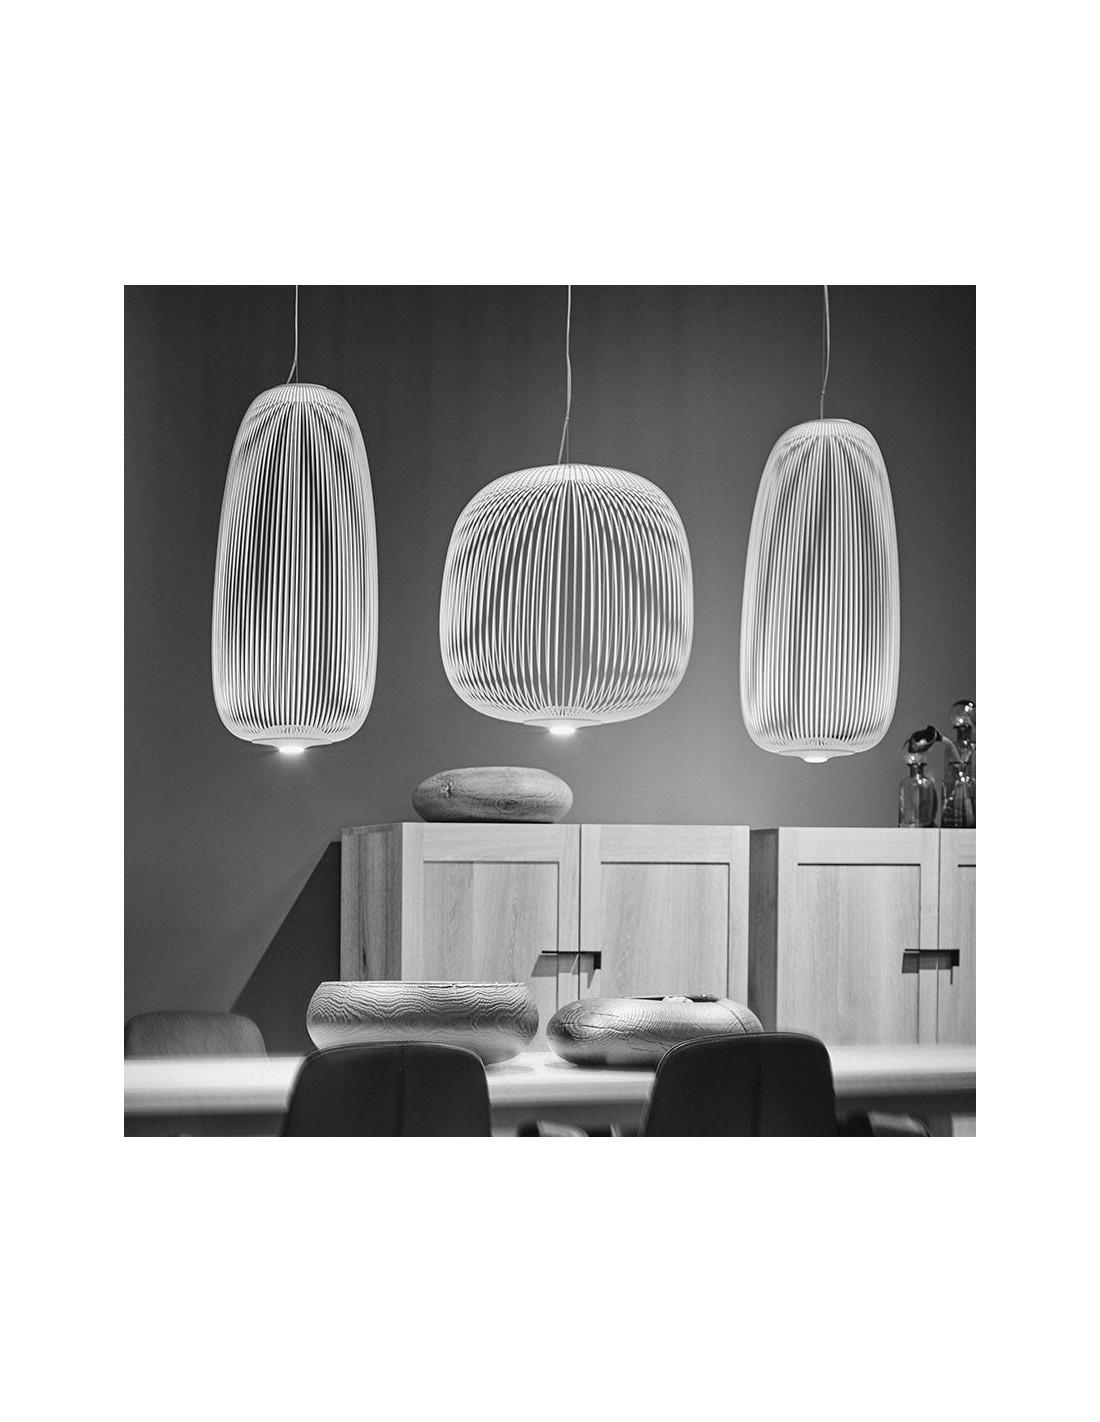 Suspension Spokes 1 blanche Foscarini Valente Design en composition